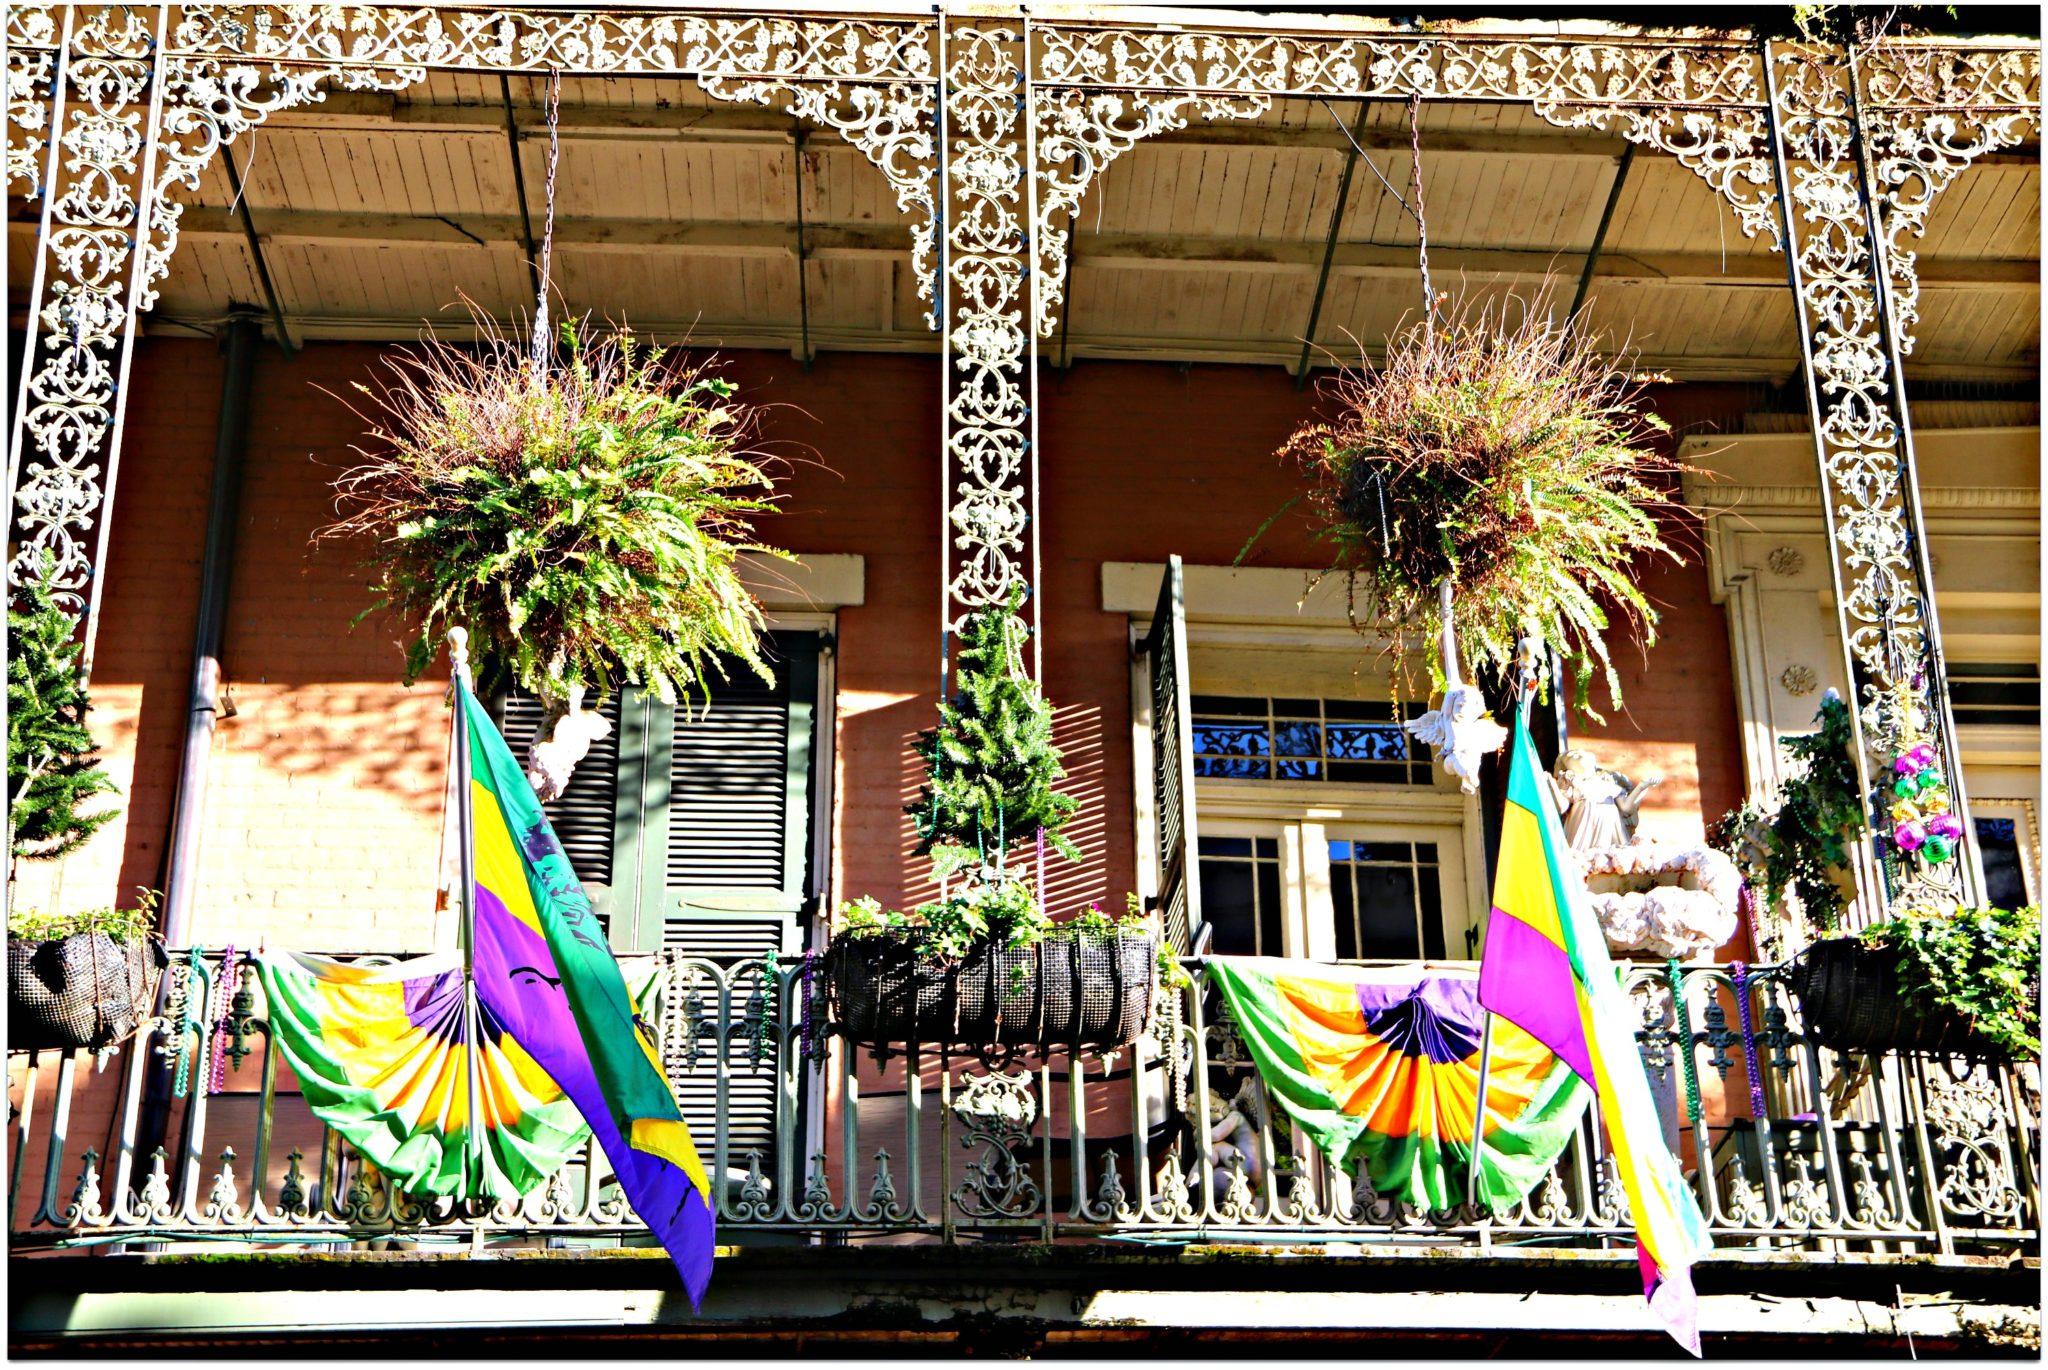 mardi gras balcony rental Mardi Gras Flags On Balcony New Orleans French Quarter Condos